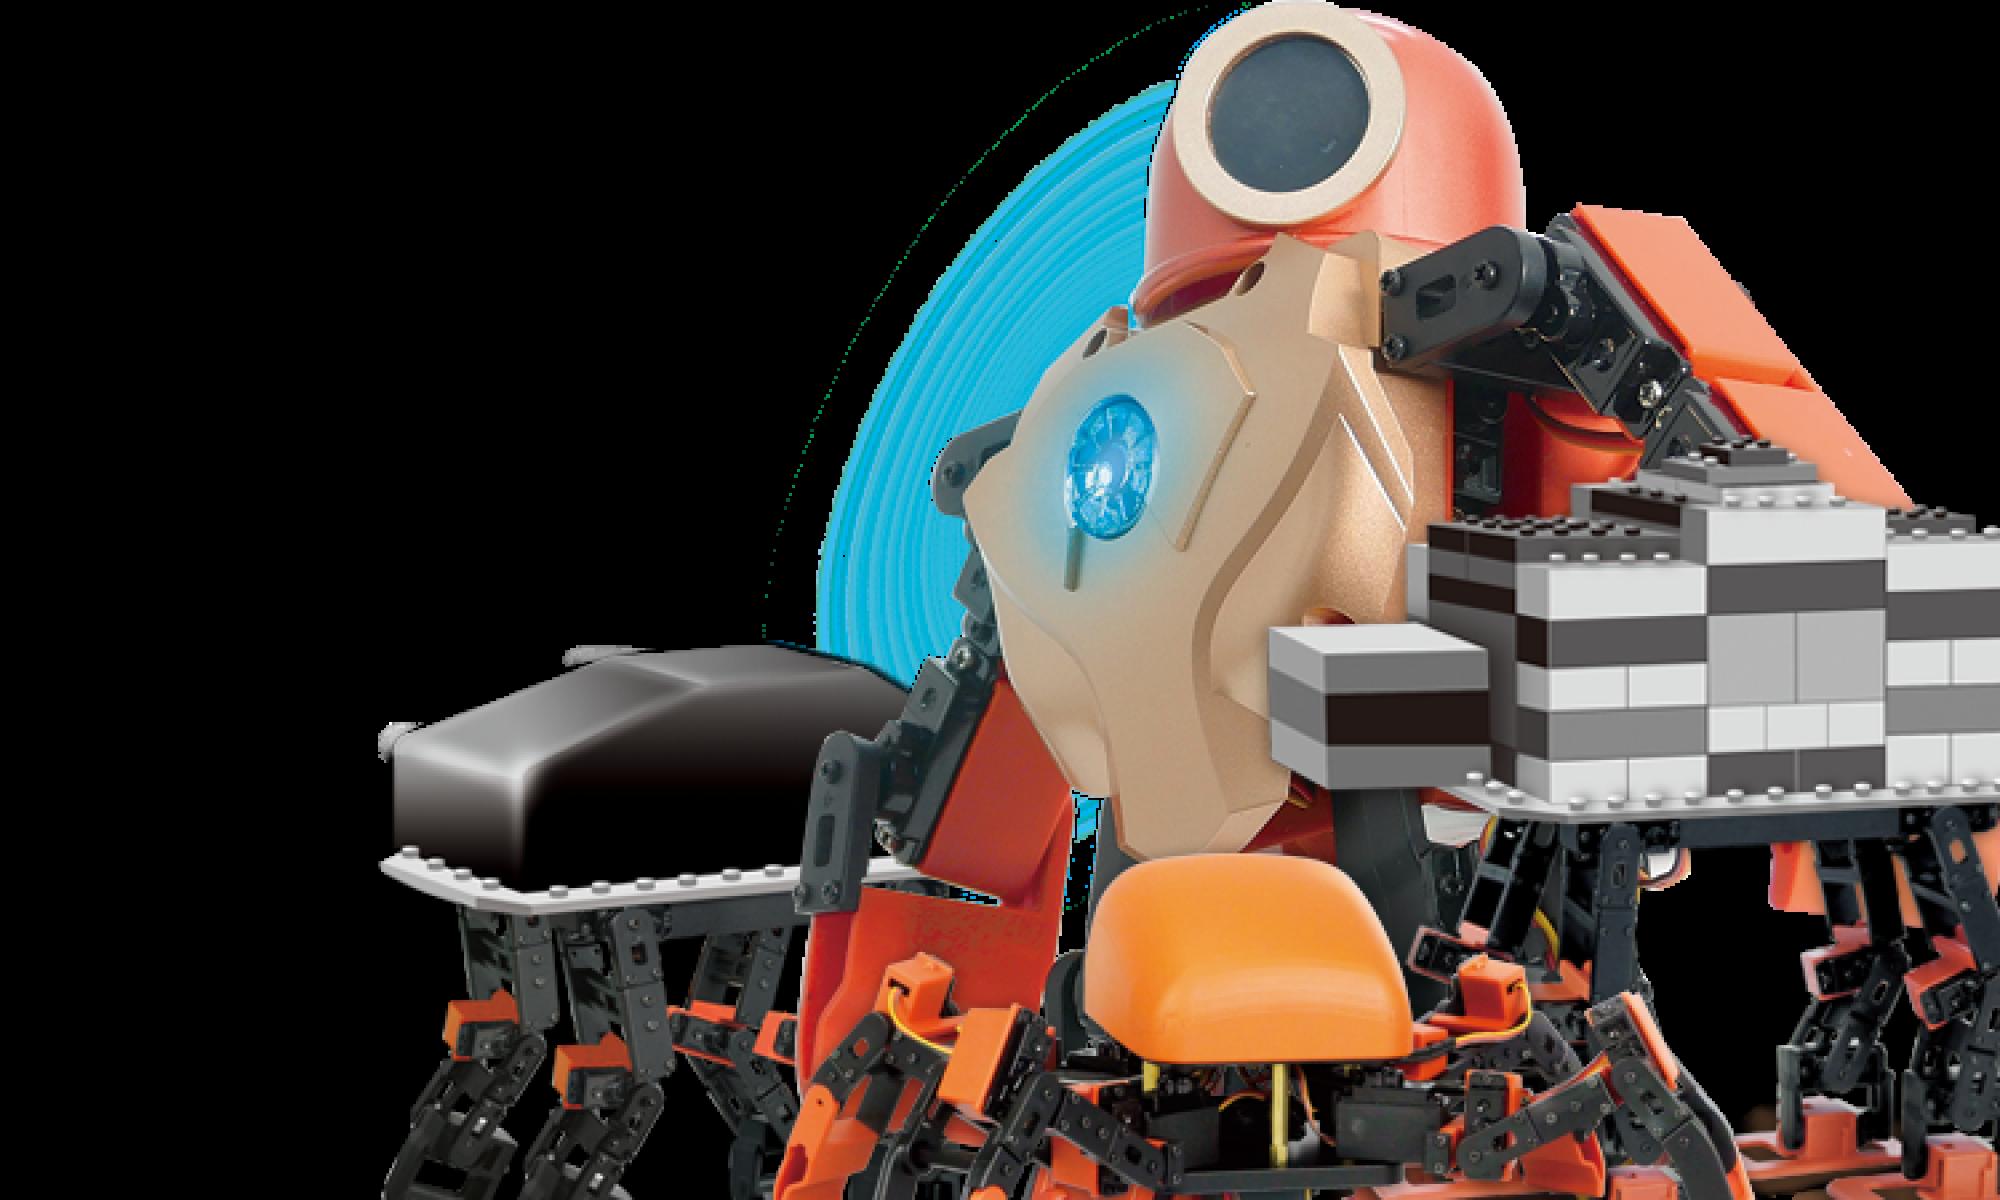 RoboHero